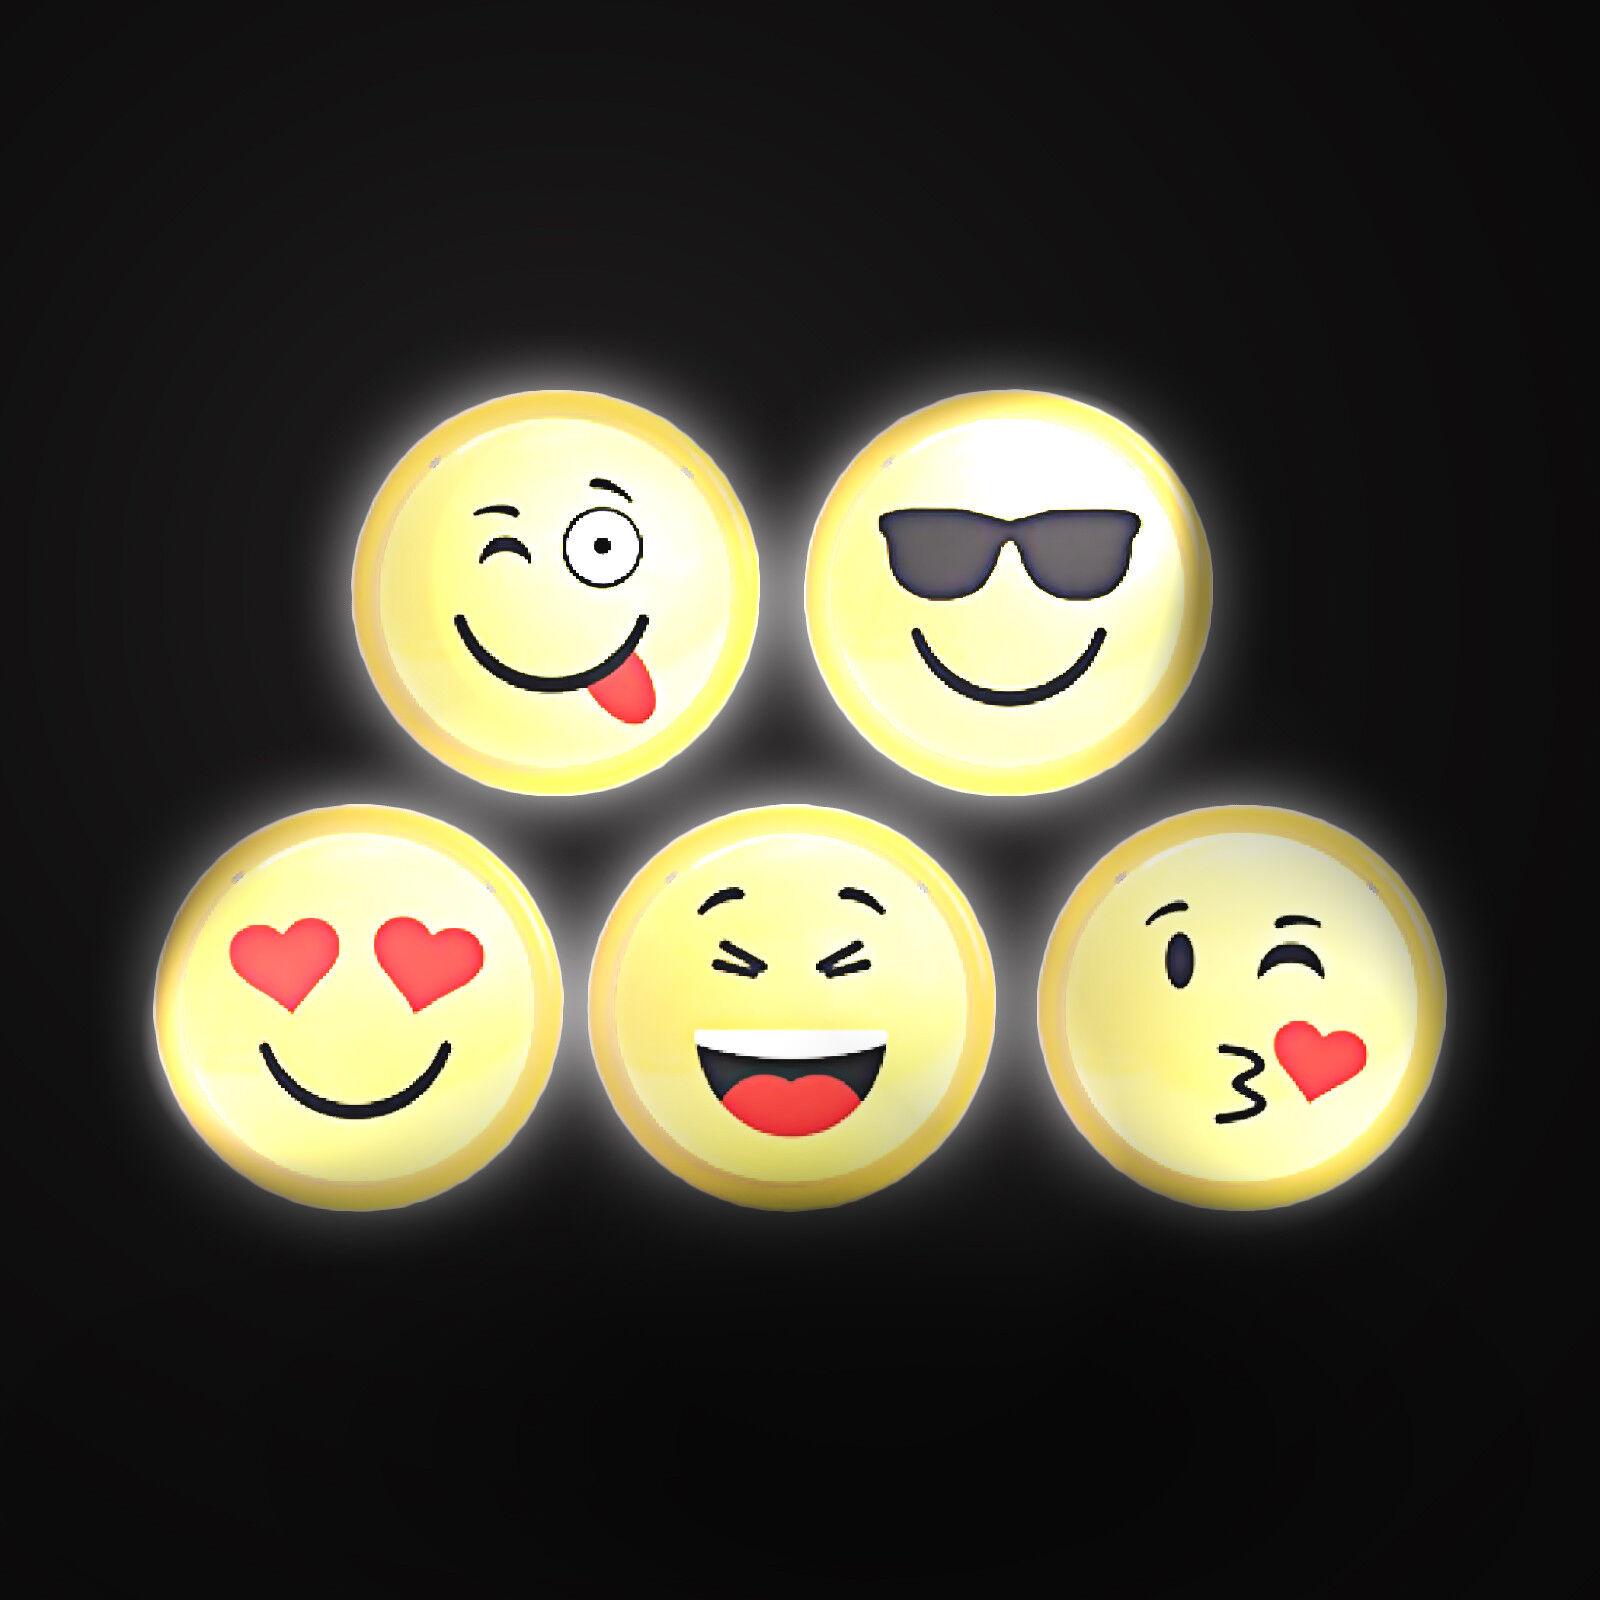 Emoji Bedroom Accessories Emoticon Happy Poo Night Light Table Bedside Lamp For Sale Ebay